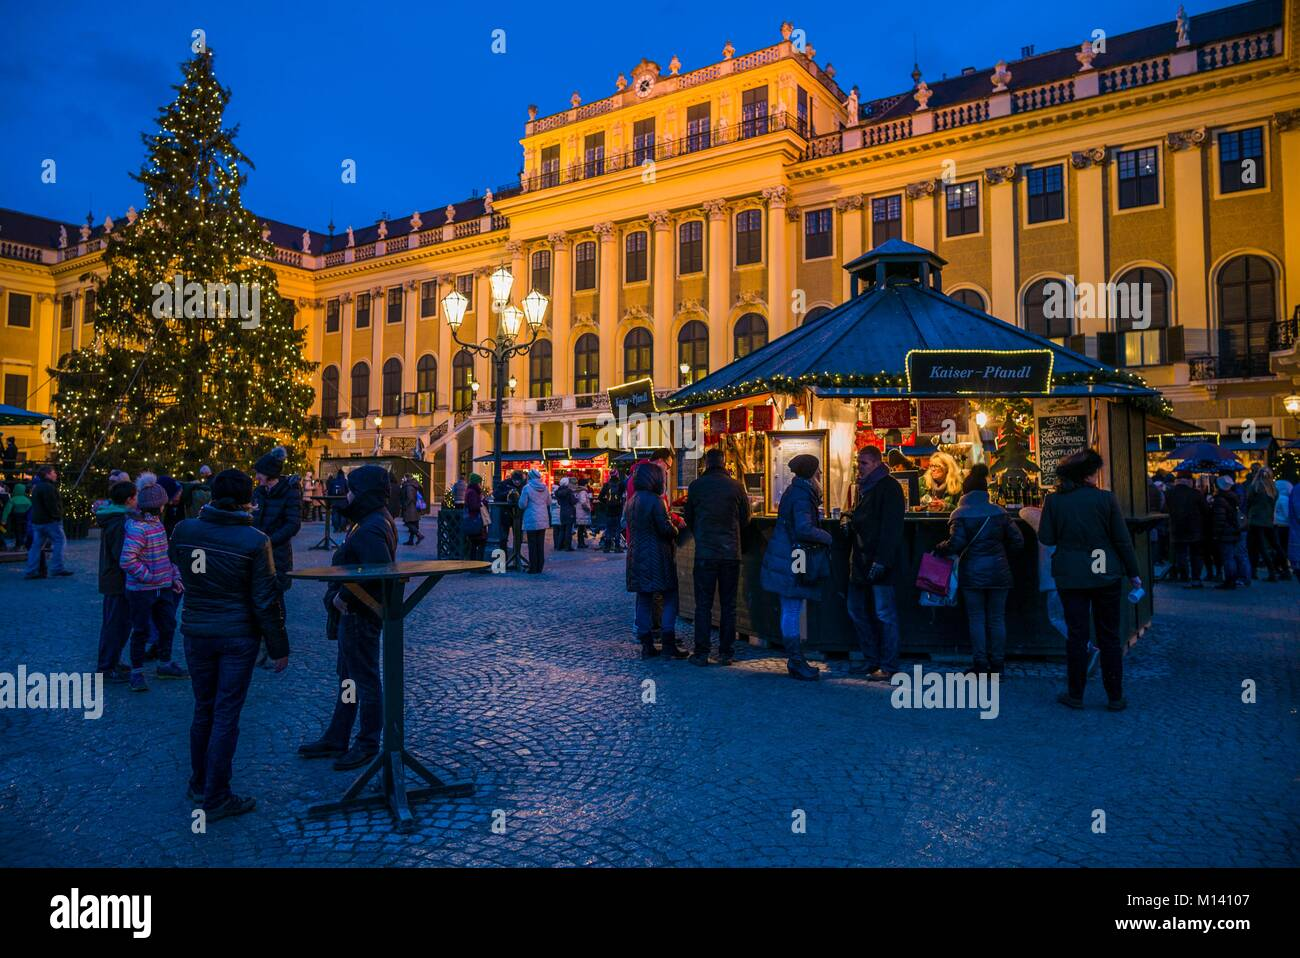 Austria, Vienna, Schonbrunn Palace, Christmas Market, evening Stock Photo